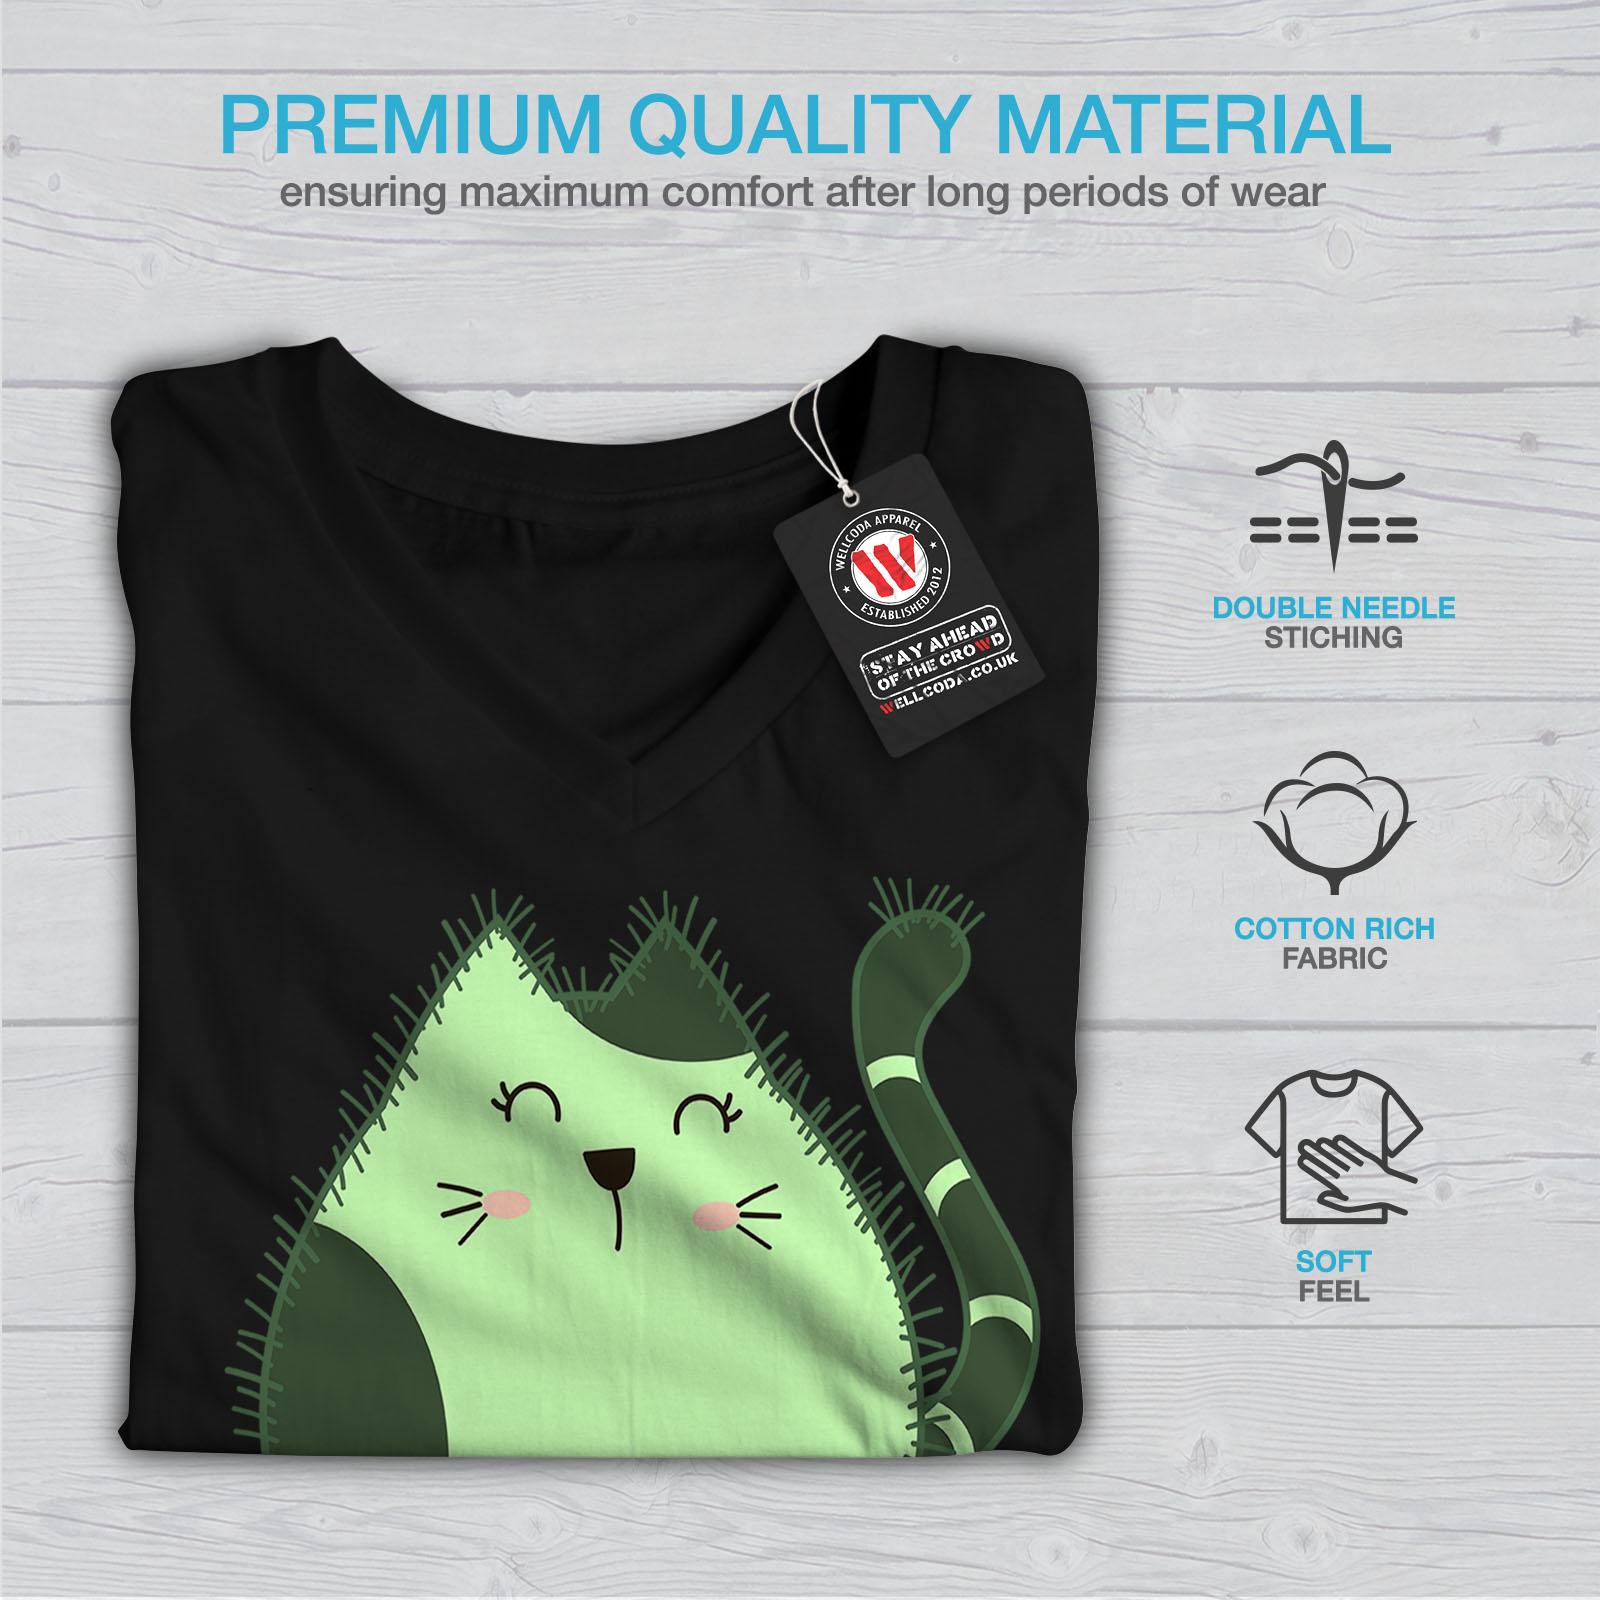 Wellcoda-Cat-Cactus-Womens-V-Neck-T-shirt-Funny-Animal-Graphic-Design-Tee thumbnail 5